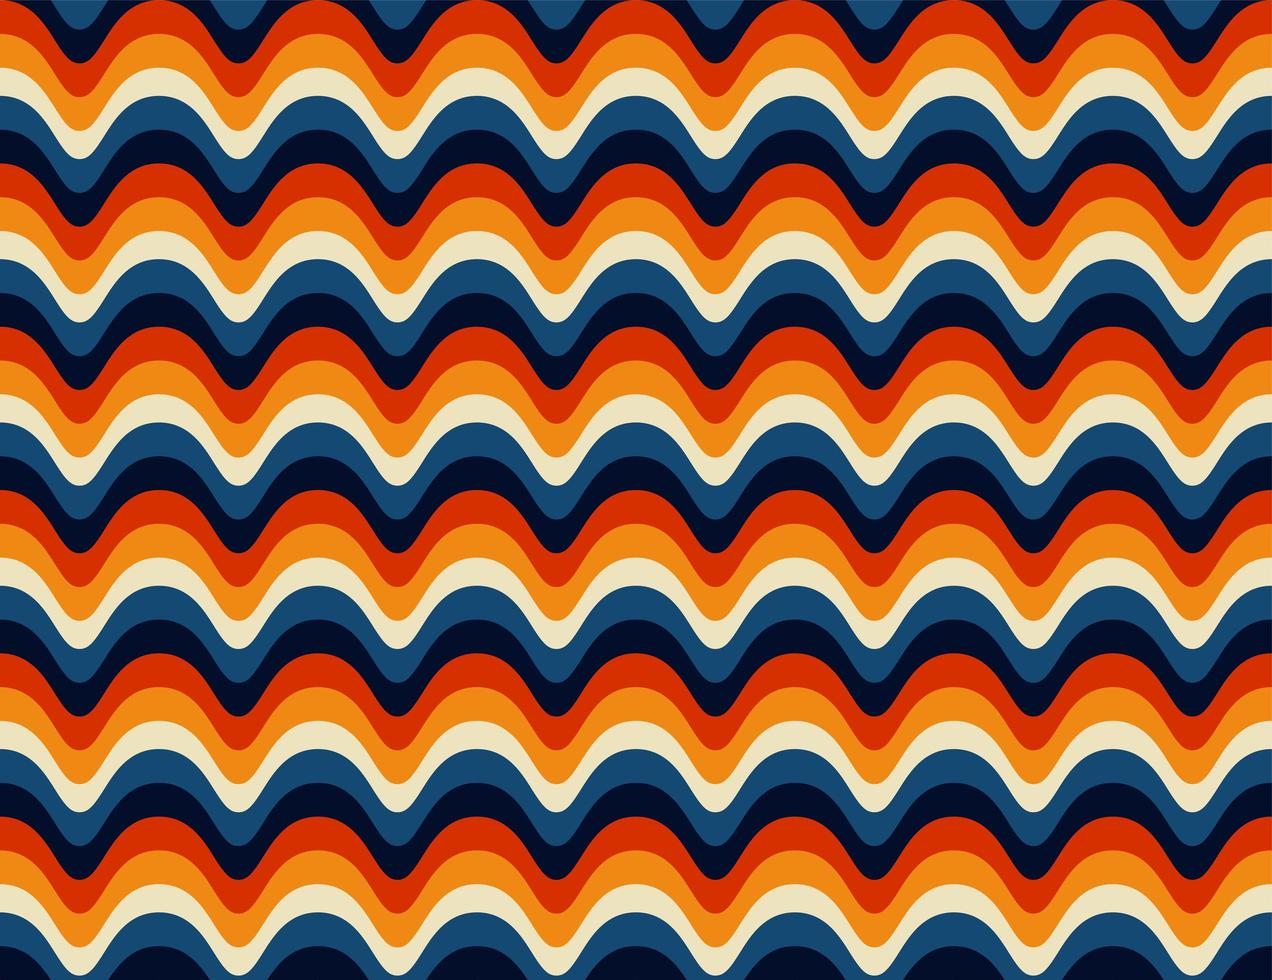 nahtloses Cuved Retro 70er Jahre Muster vektor